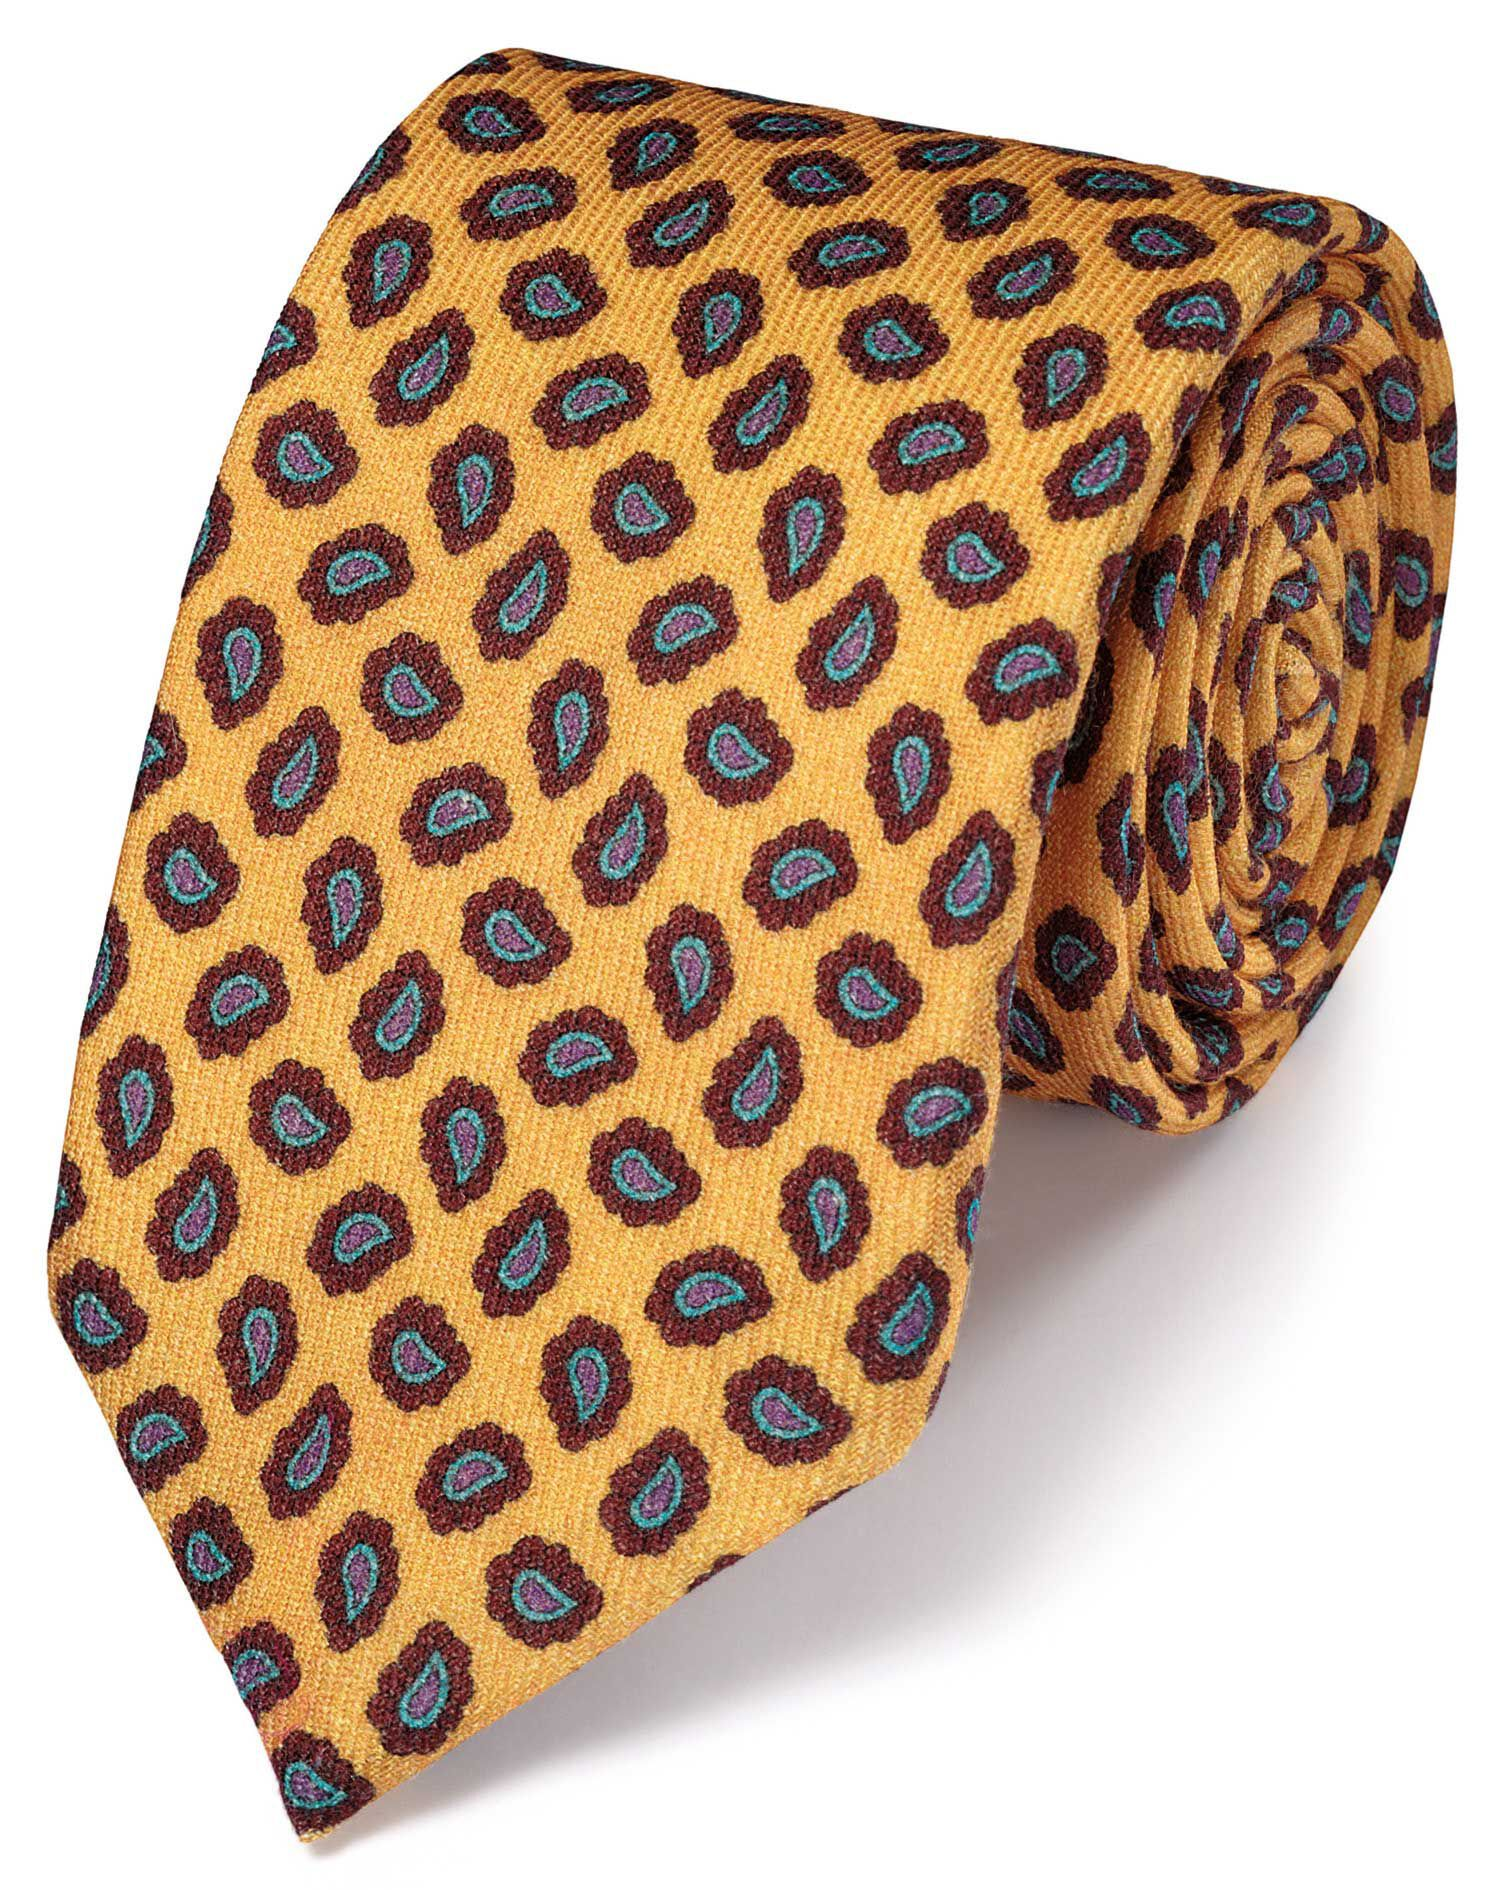 Gold Silk Print Luxury Tie Size OSFA by Charles Tyrwhitt